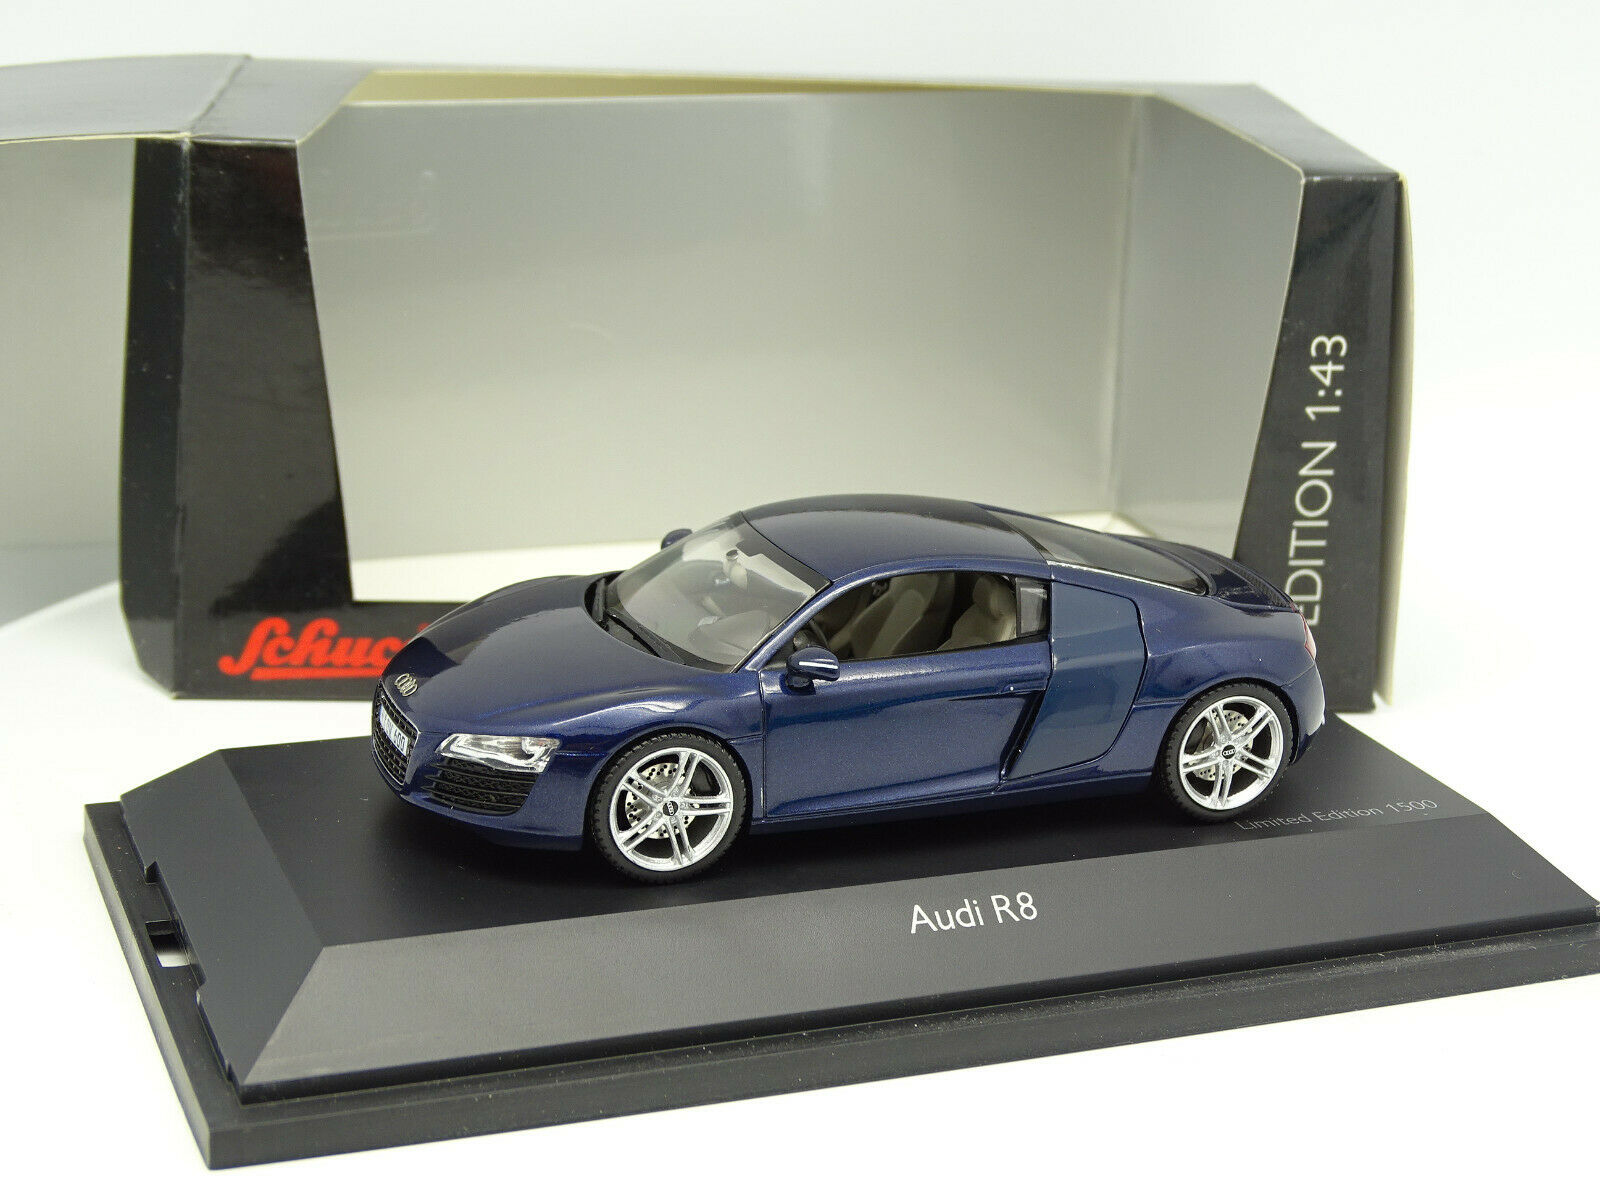 Schuco 1 43 - Audi R8 Azul